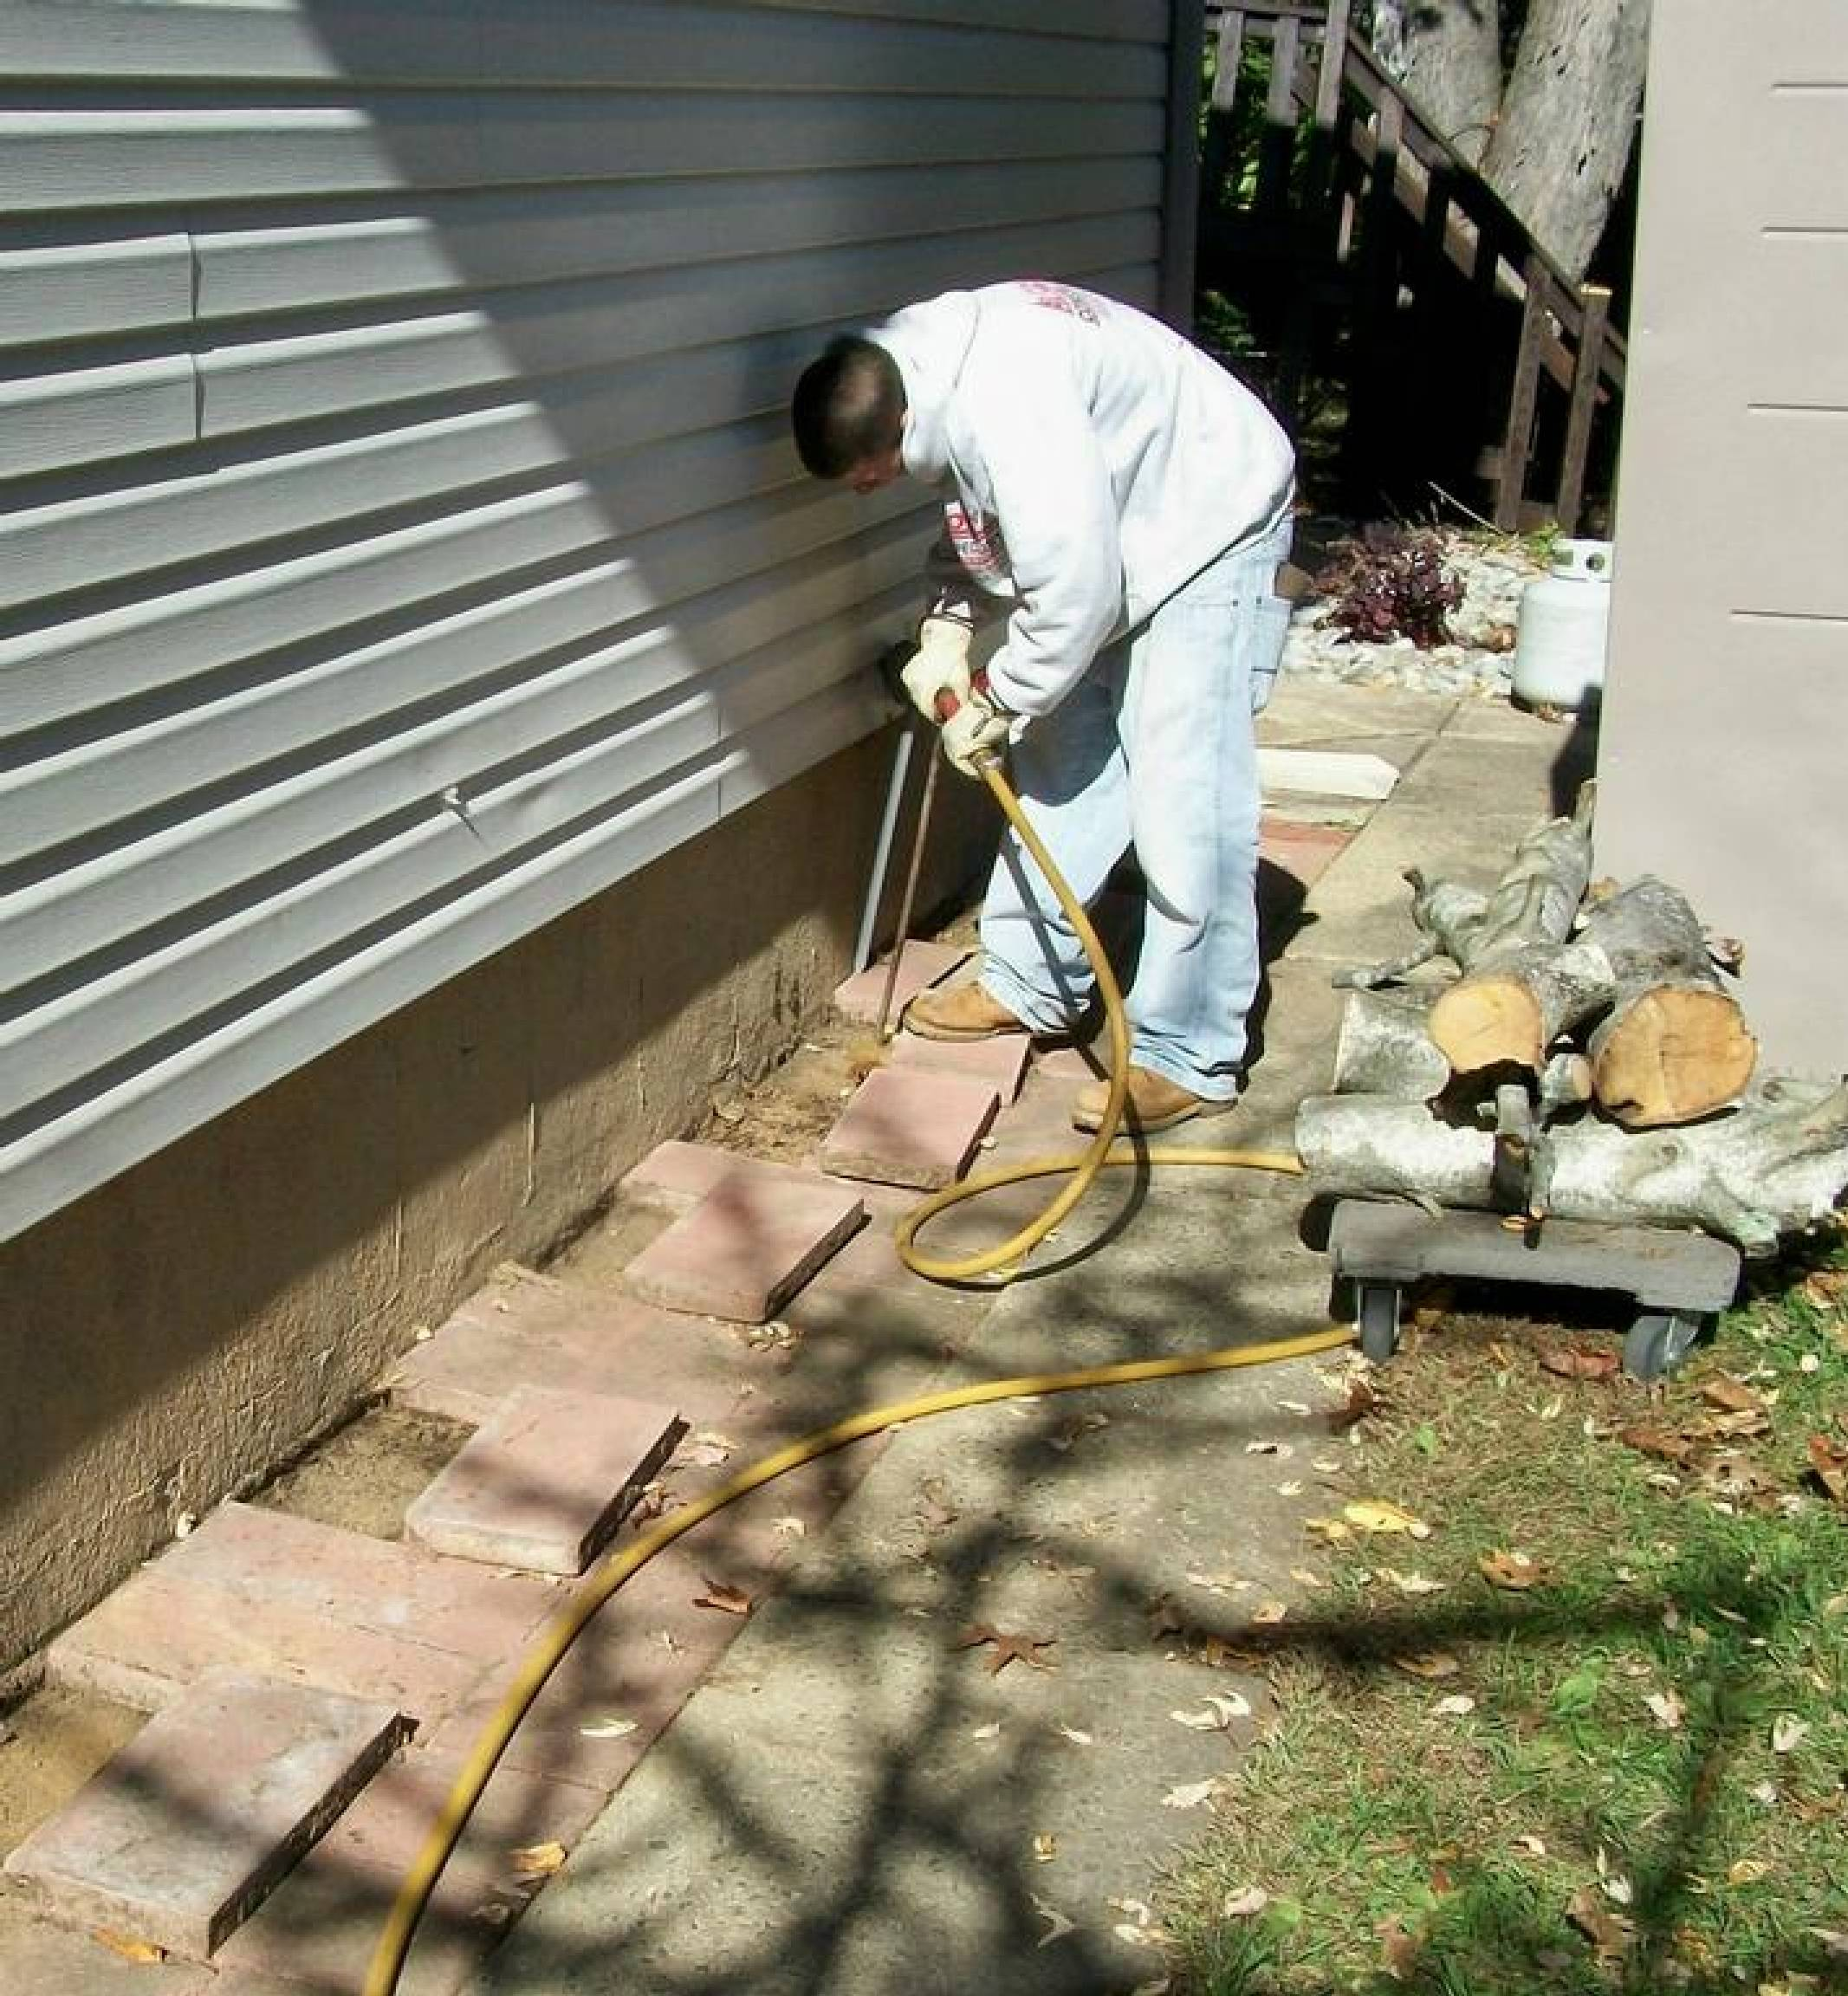 Subterranean Termites Treatment Options